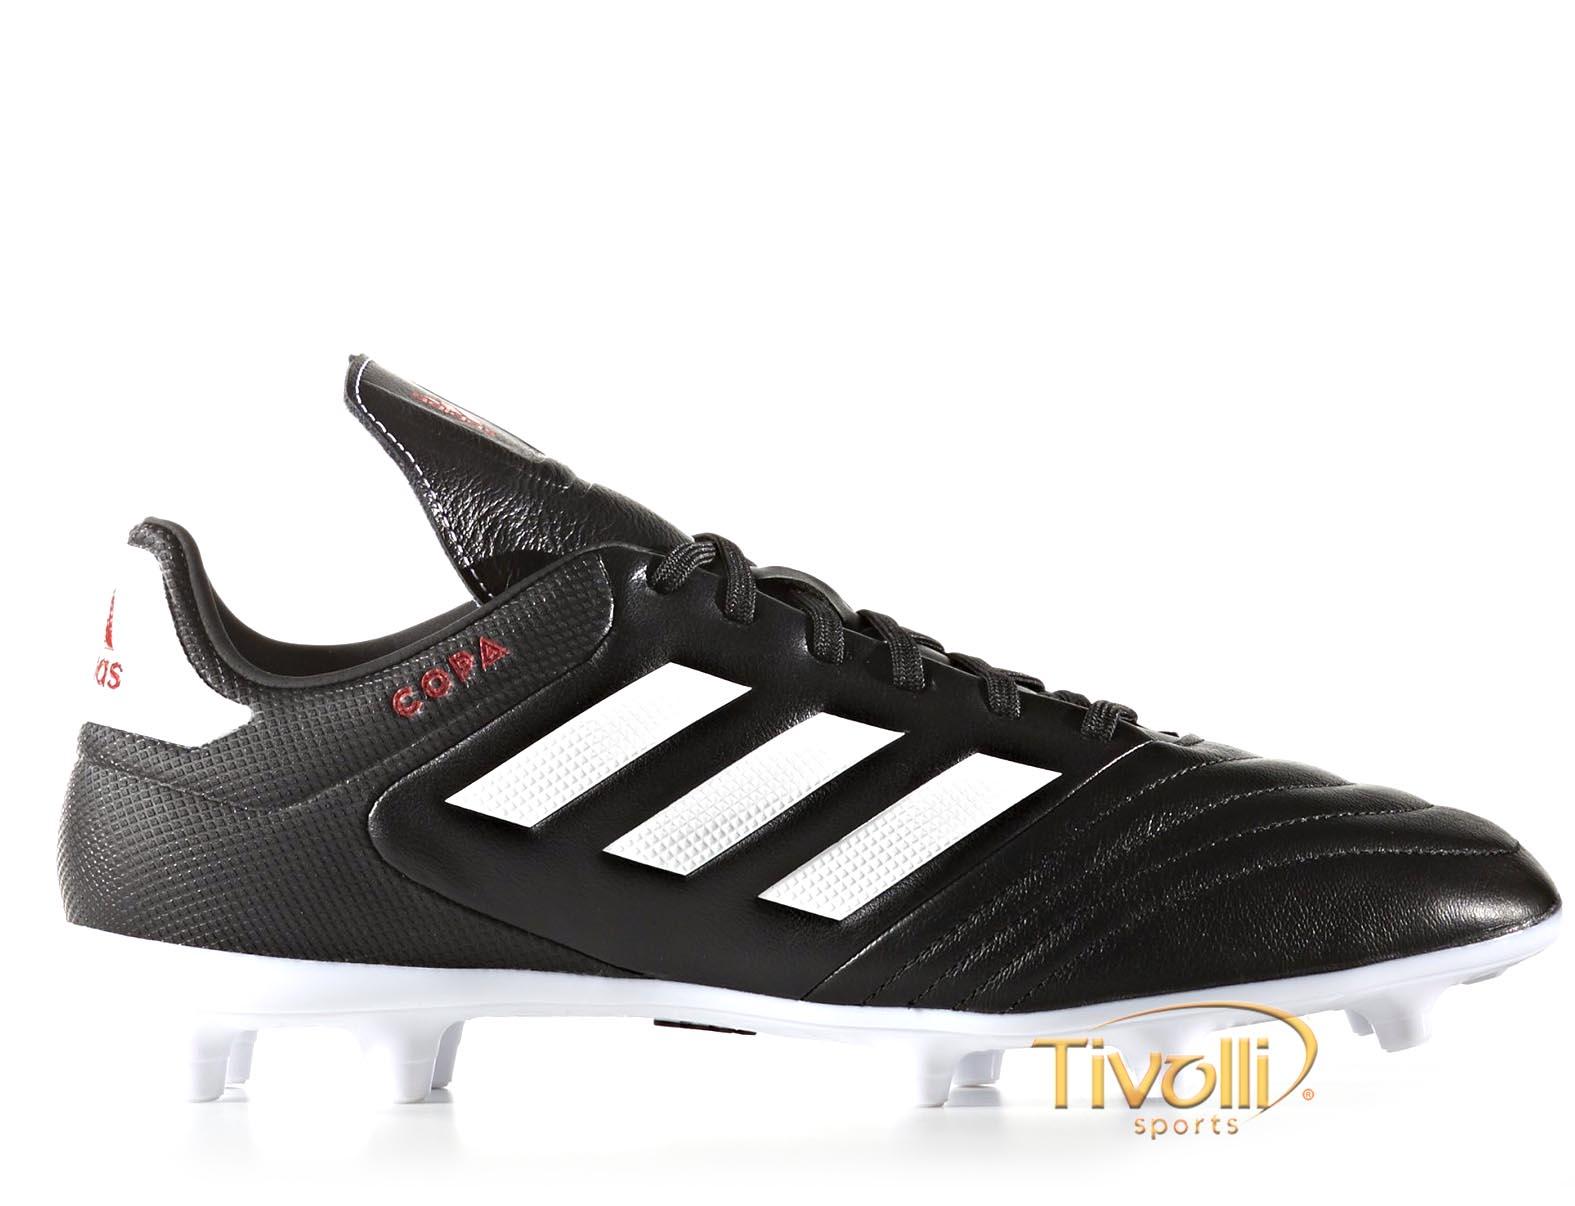 bbf1a836c2 Chuteira Adidas Copa 17.3 FG Campo